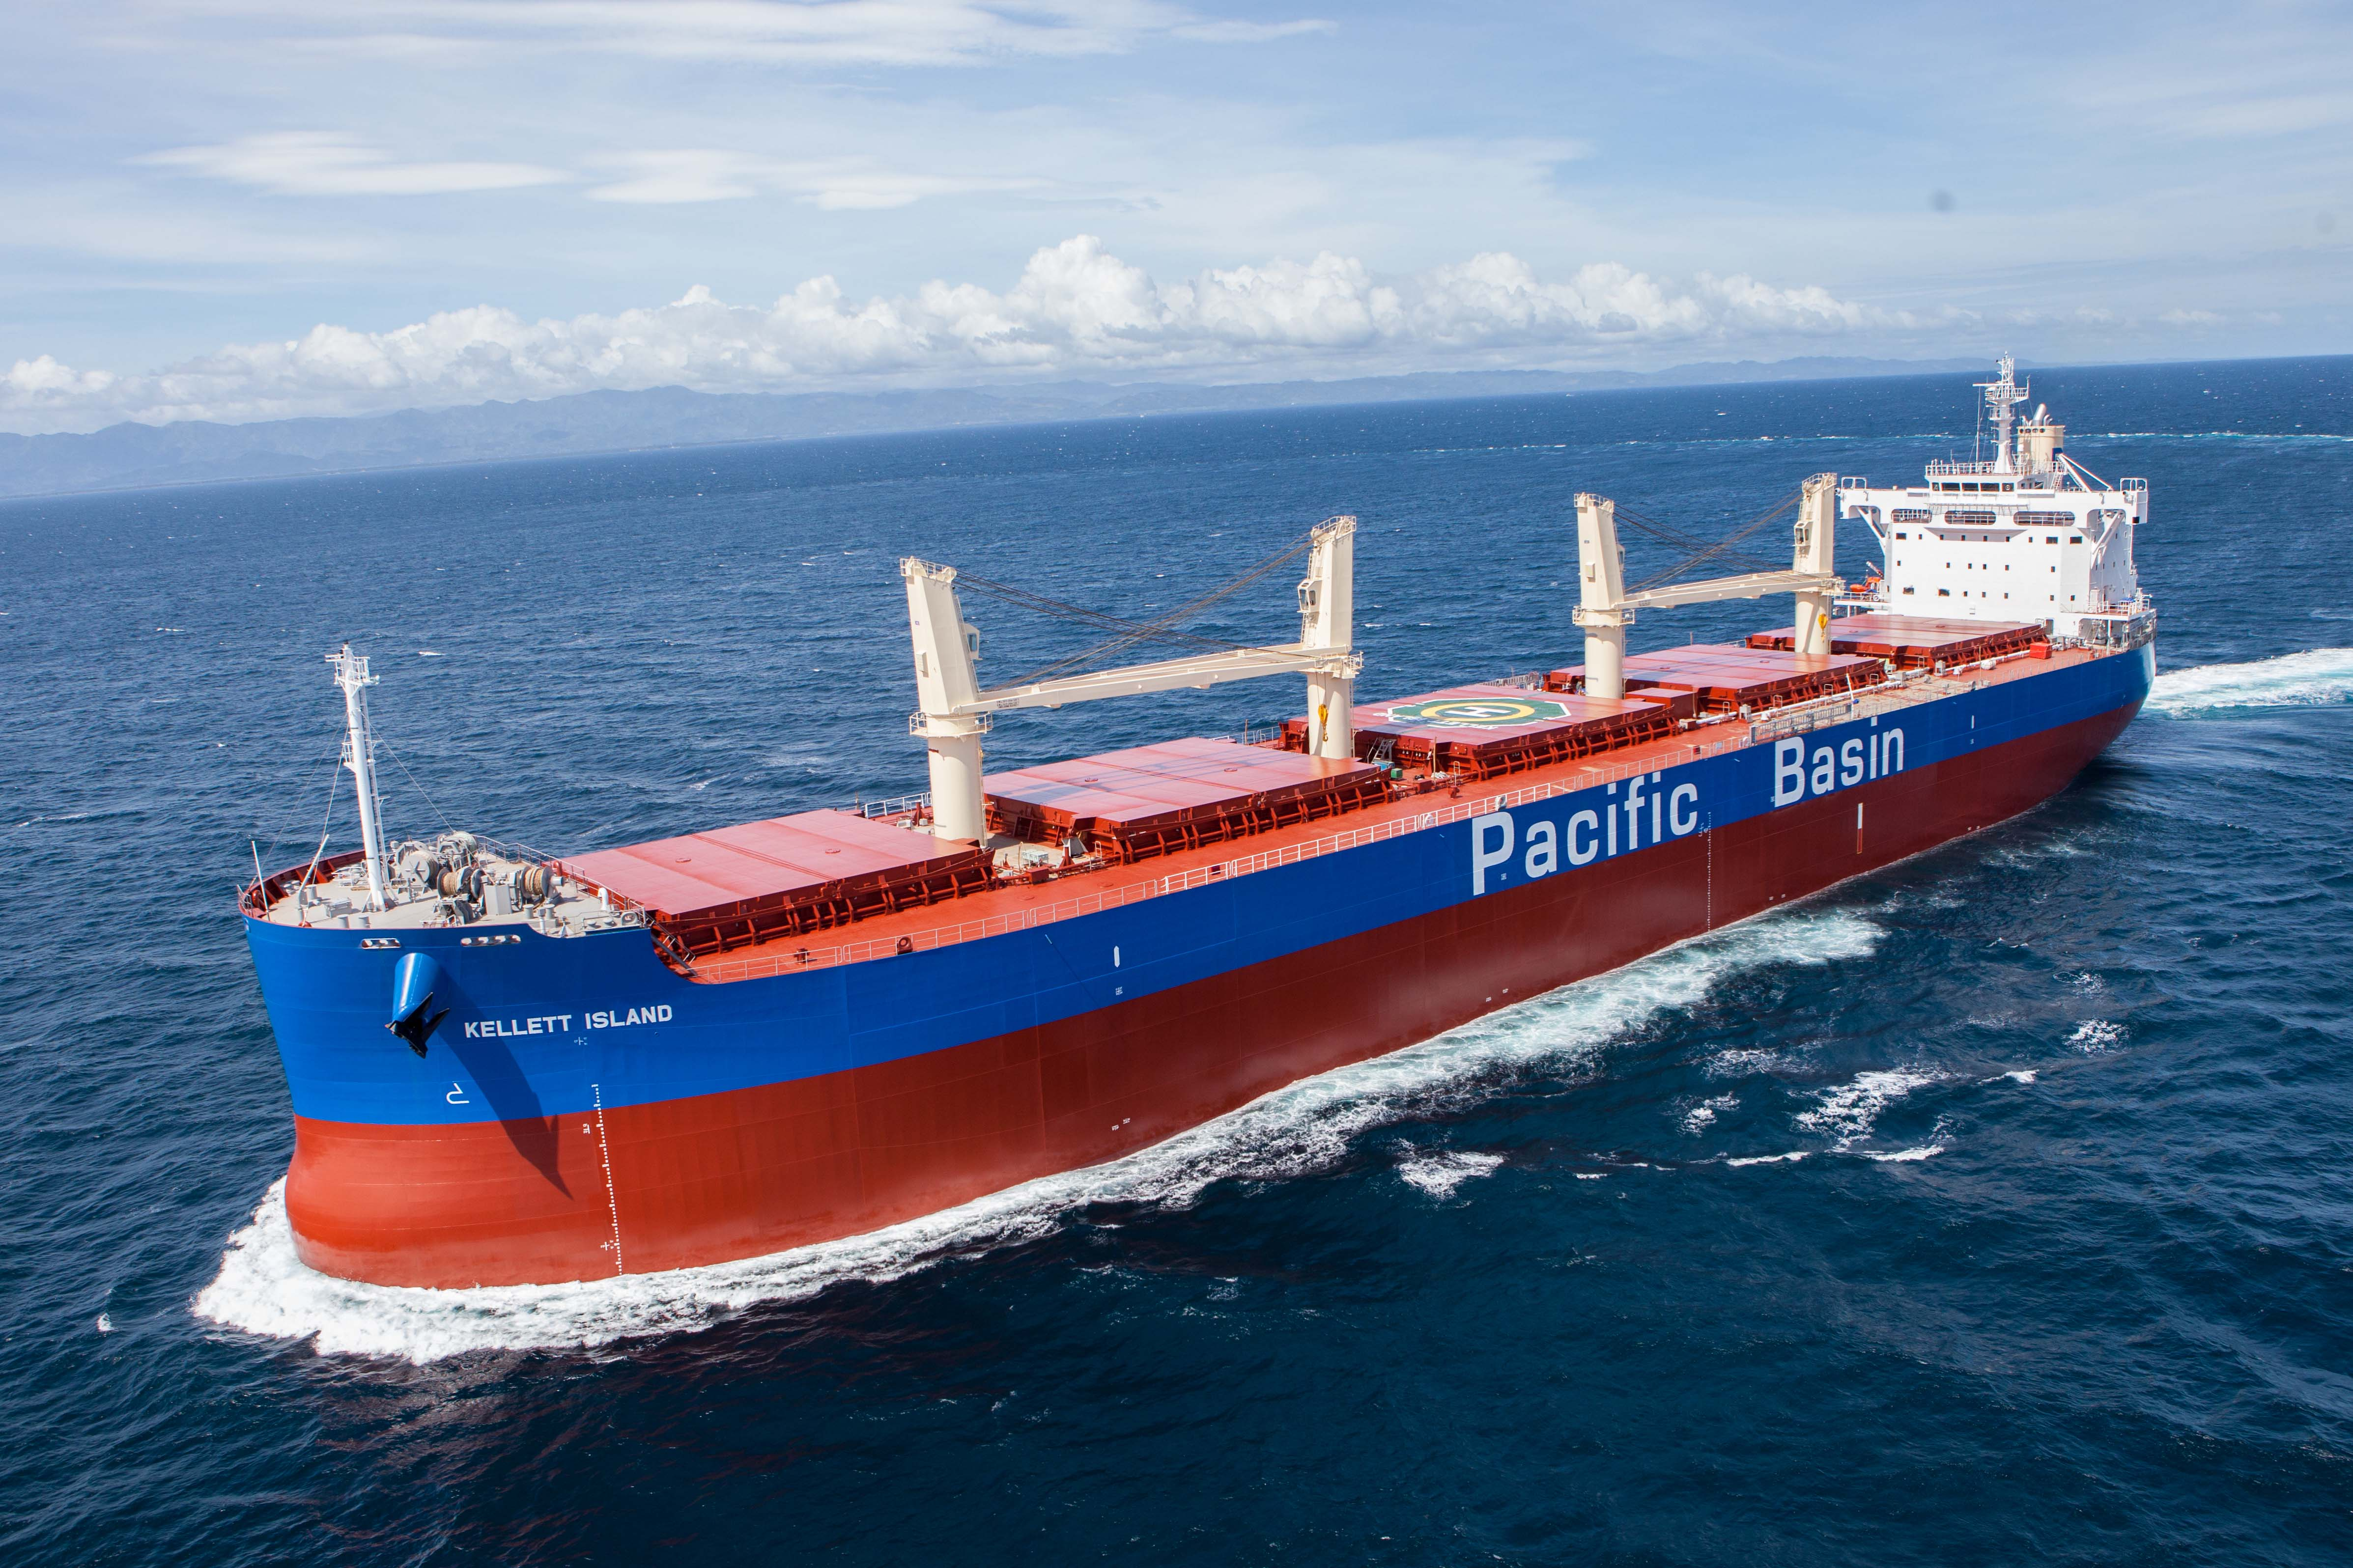 KELLETT ISLAND sea trial